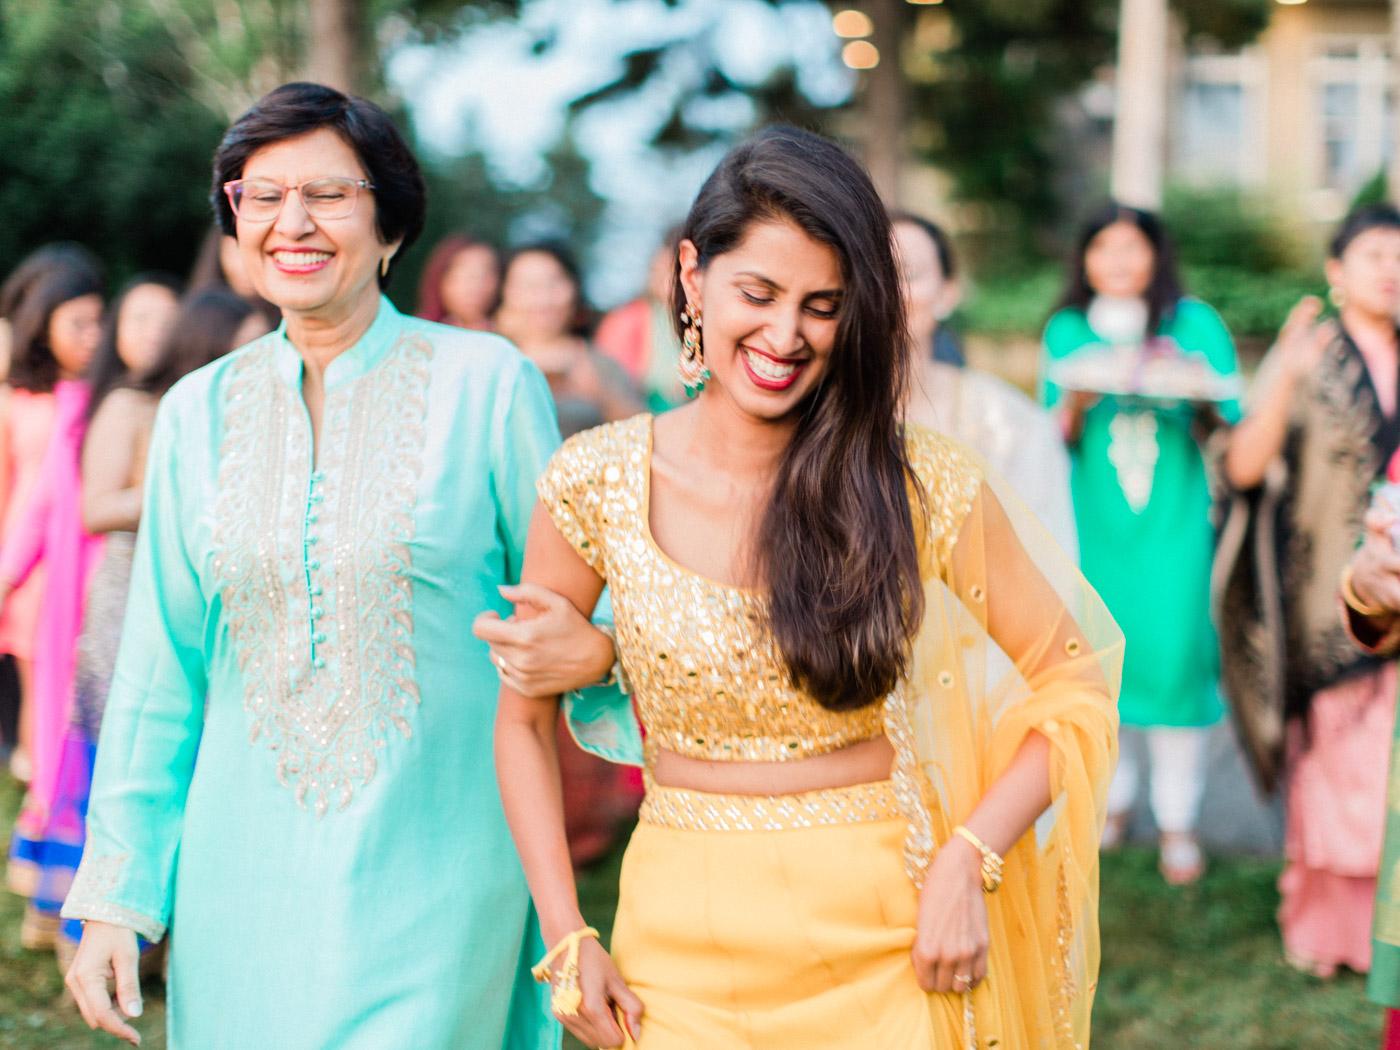 Toronto-Collingwood-wedding-photographer-indian-wedding-documentary21.jpg